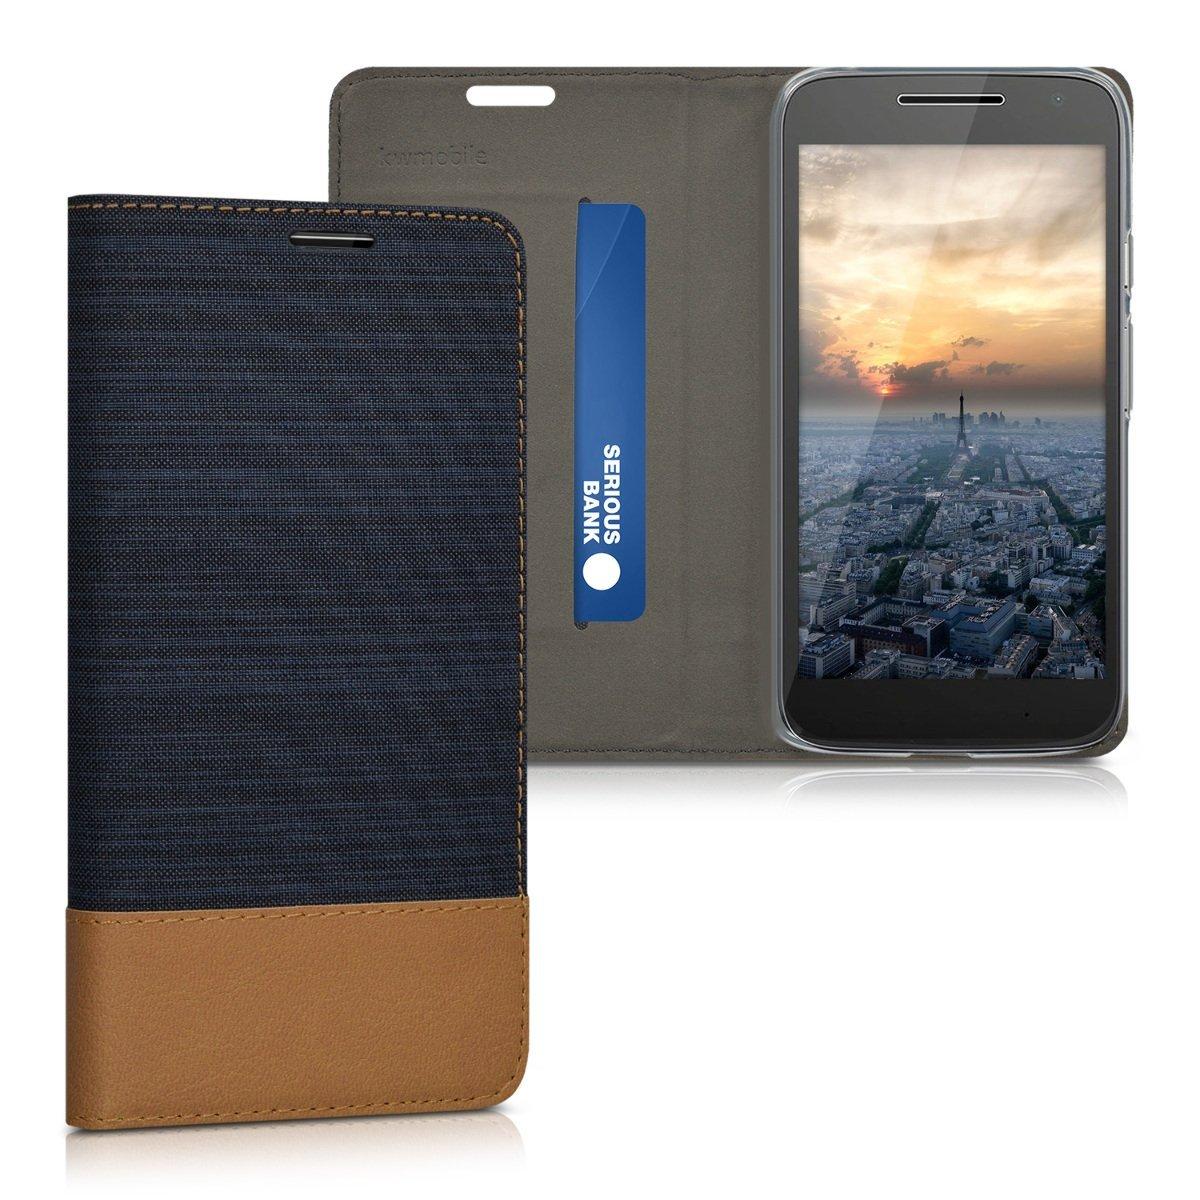 KW Θήκη - Πορτοφόλι Motorola Moto G4 Play - Dark Blue/Brown (39522.17)